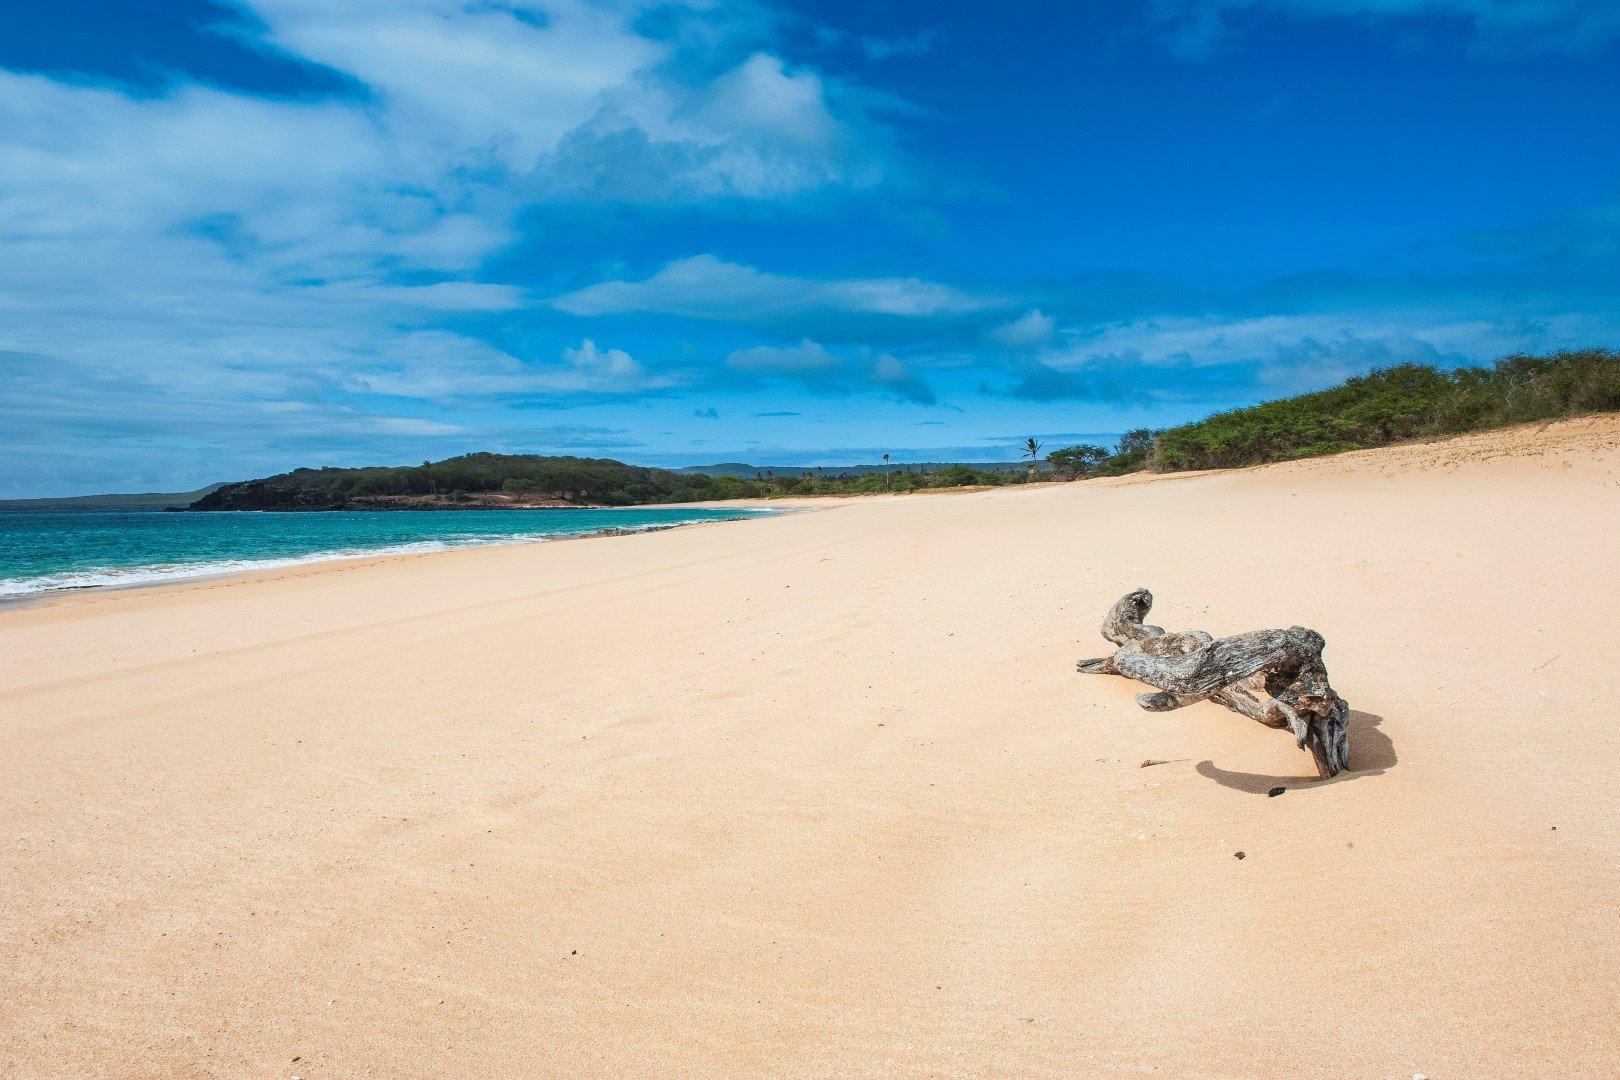 Papohaku Beach, island of Molokai, Hawaii, United States of America, Pacific